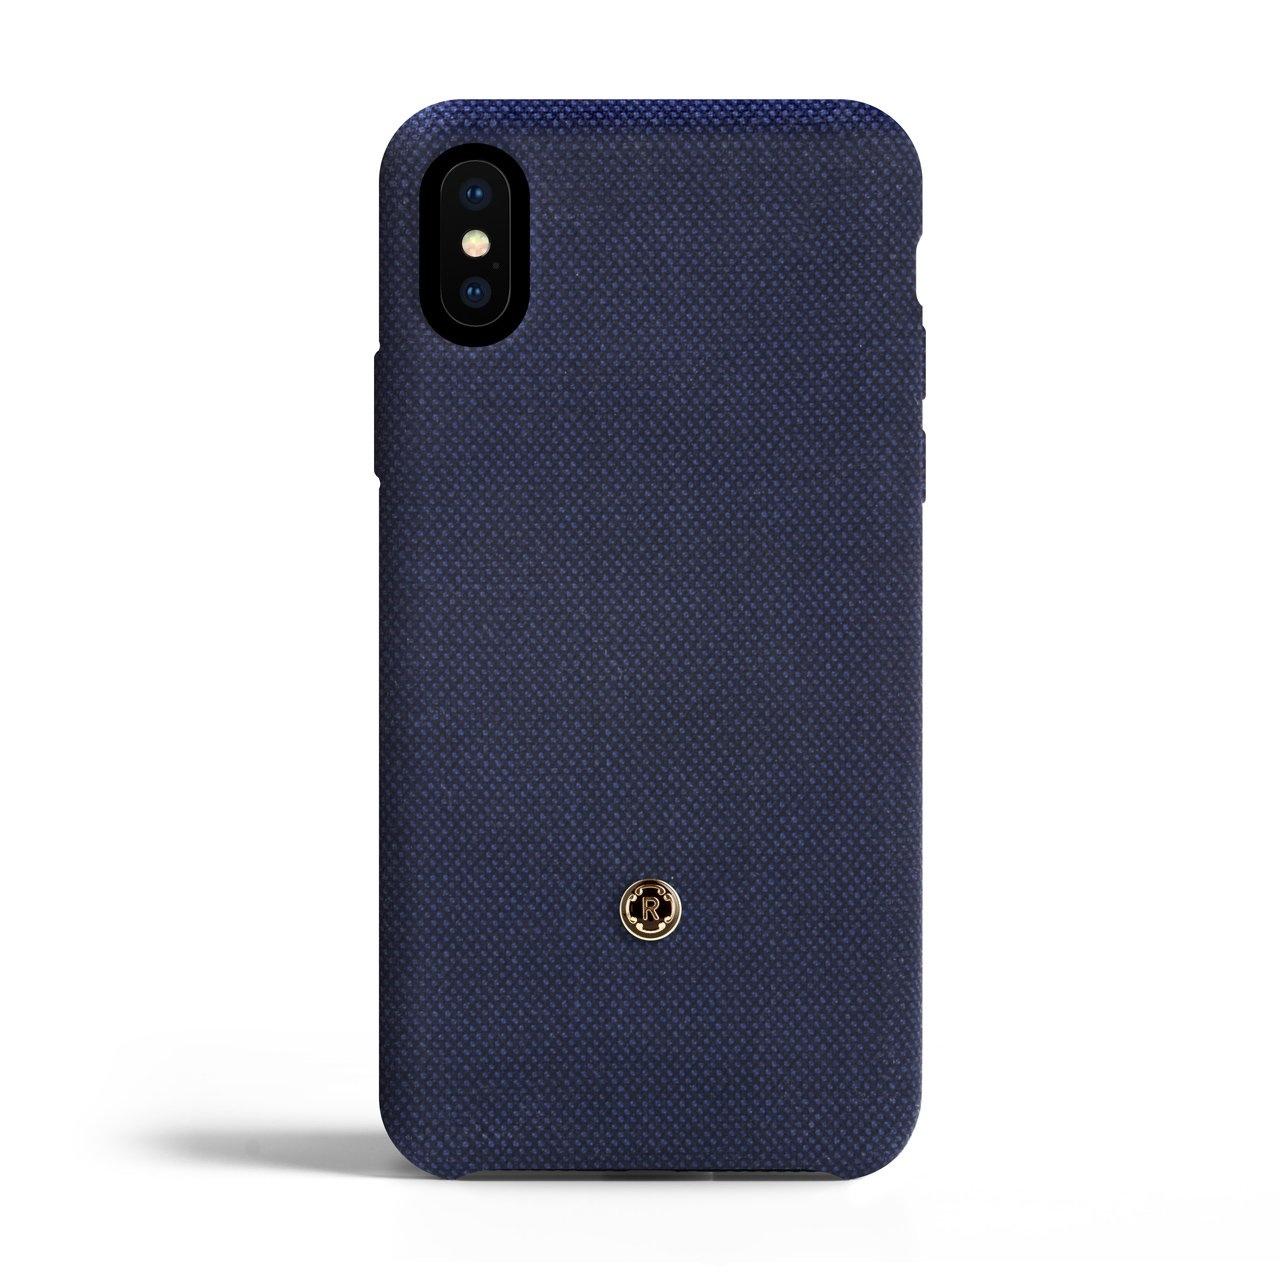 iPhone X / Xs Max Case - Bird's Eye Blue